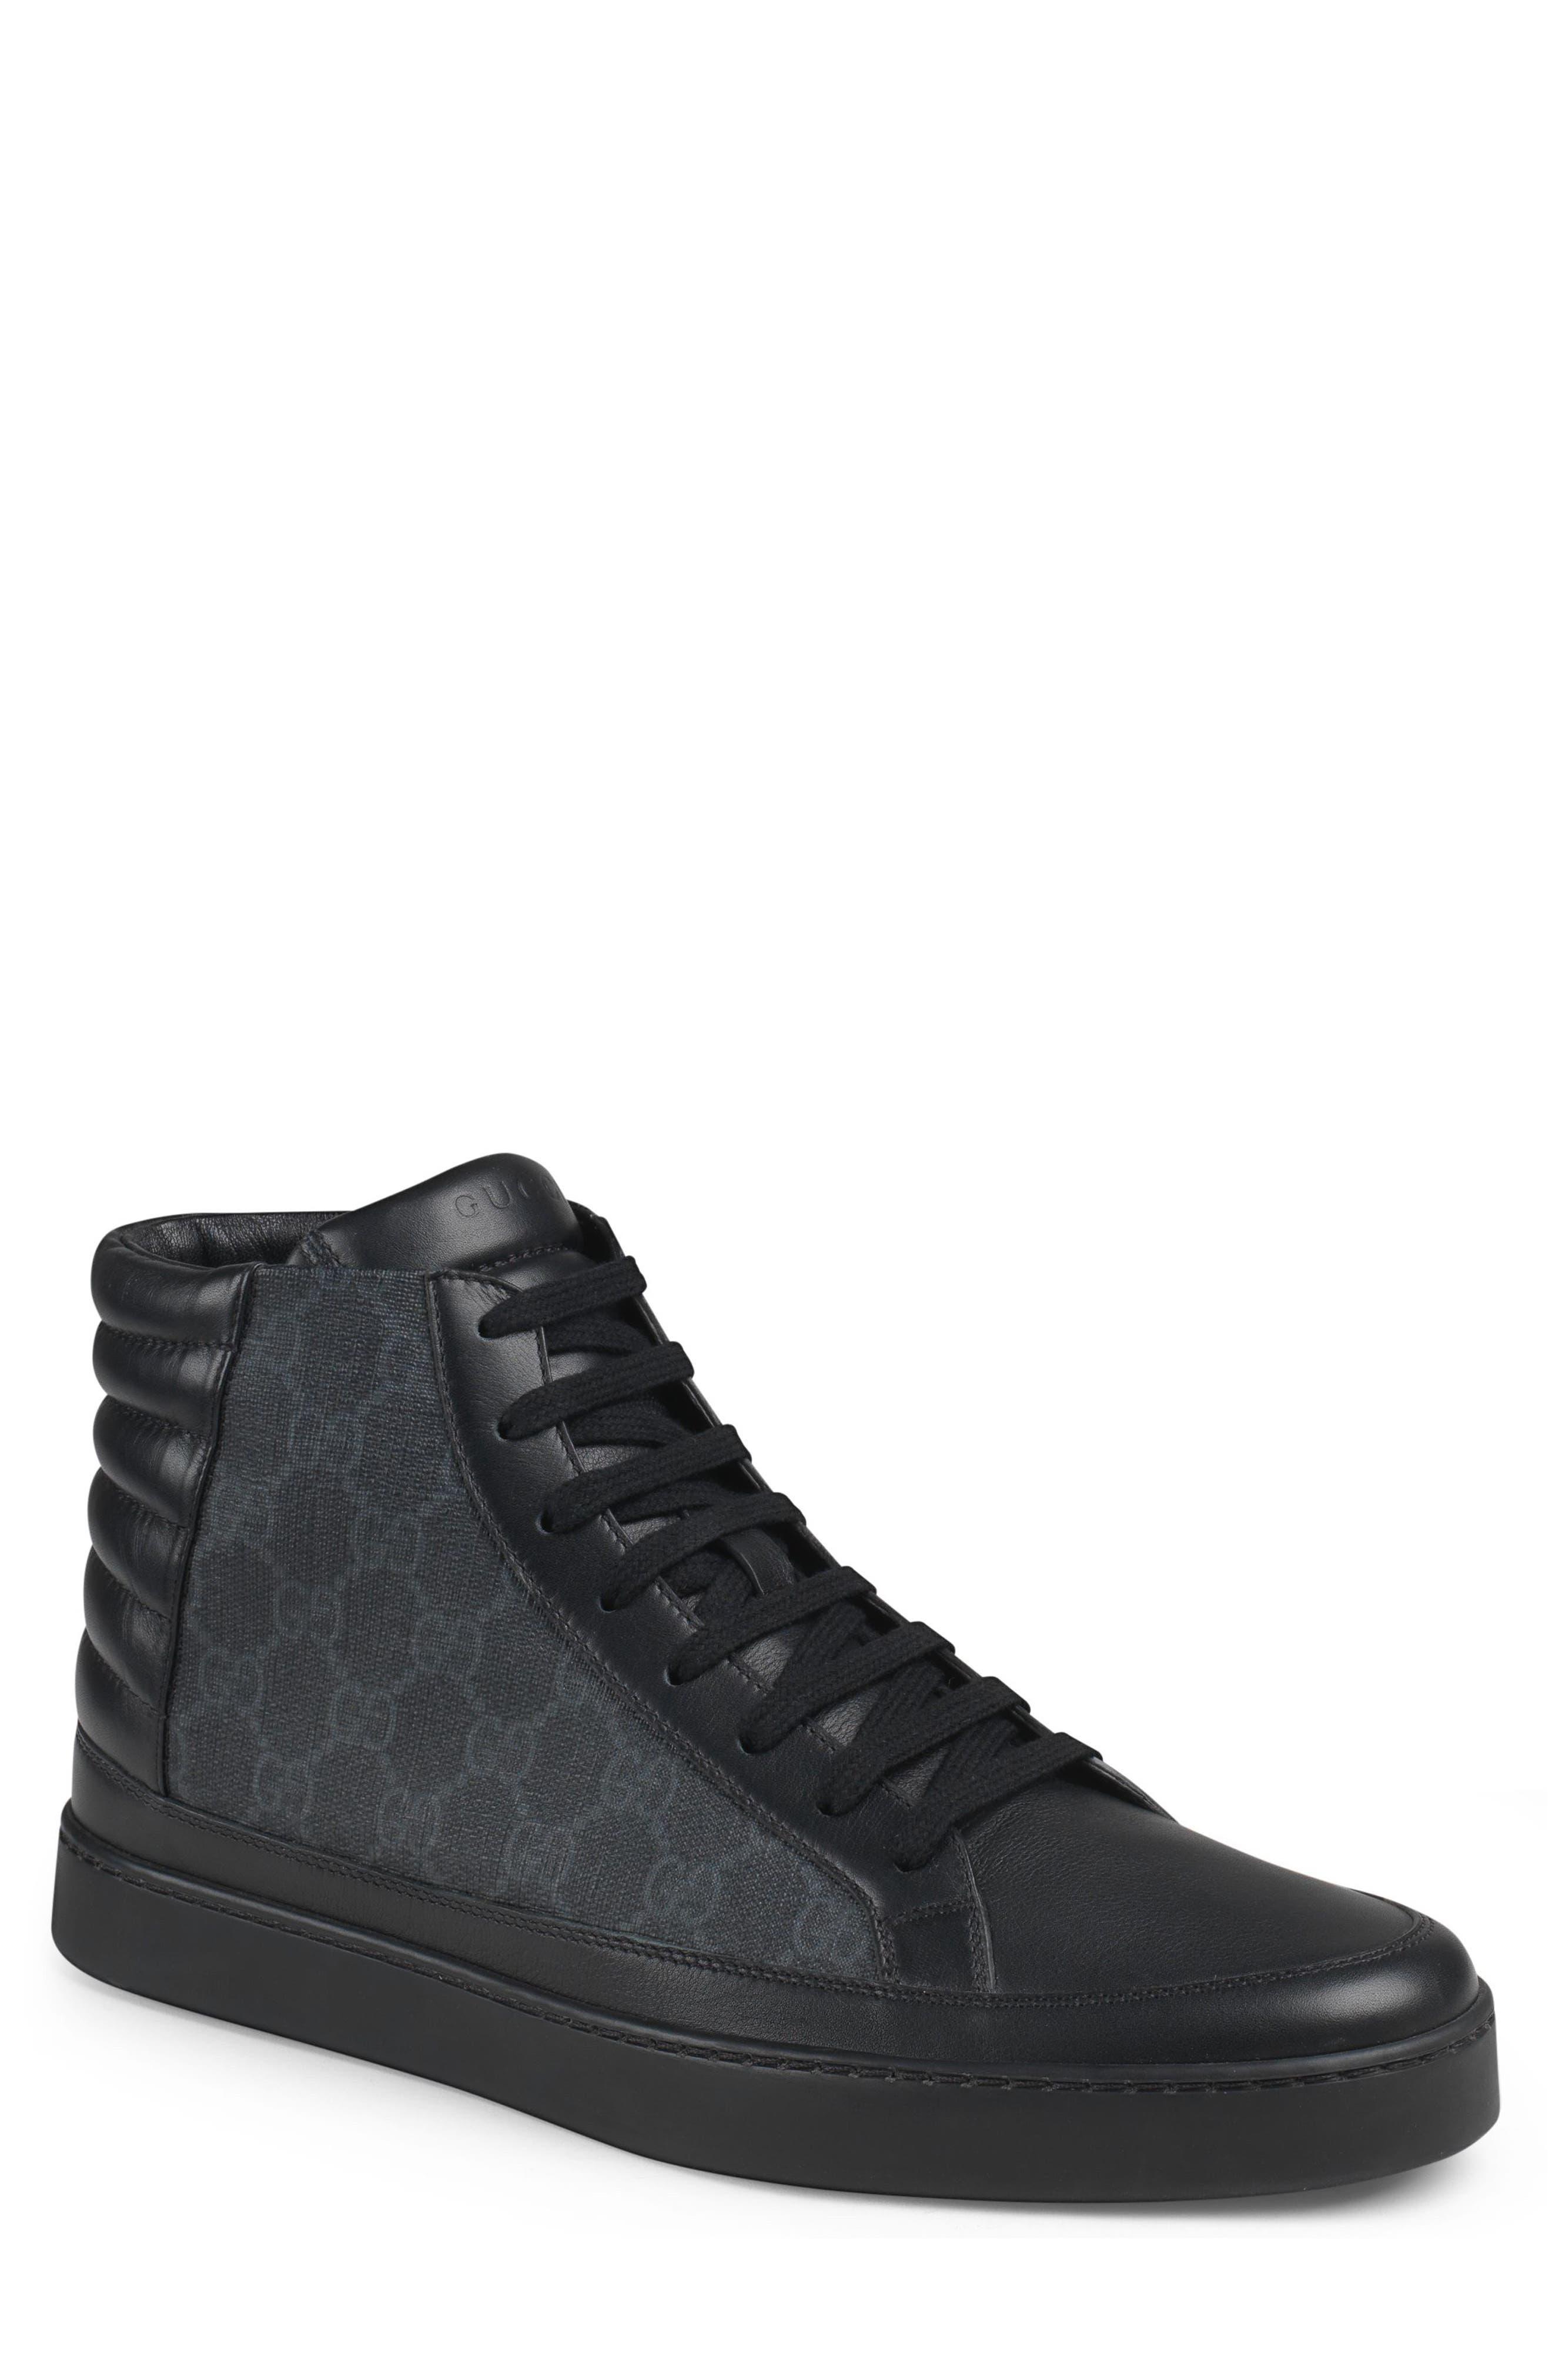 'Common' High Top Sneaker,                             Main thumbnail 1, color,                             002